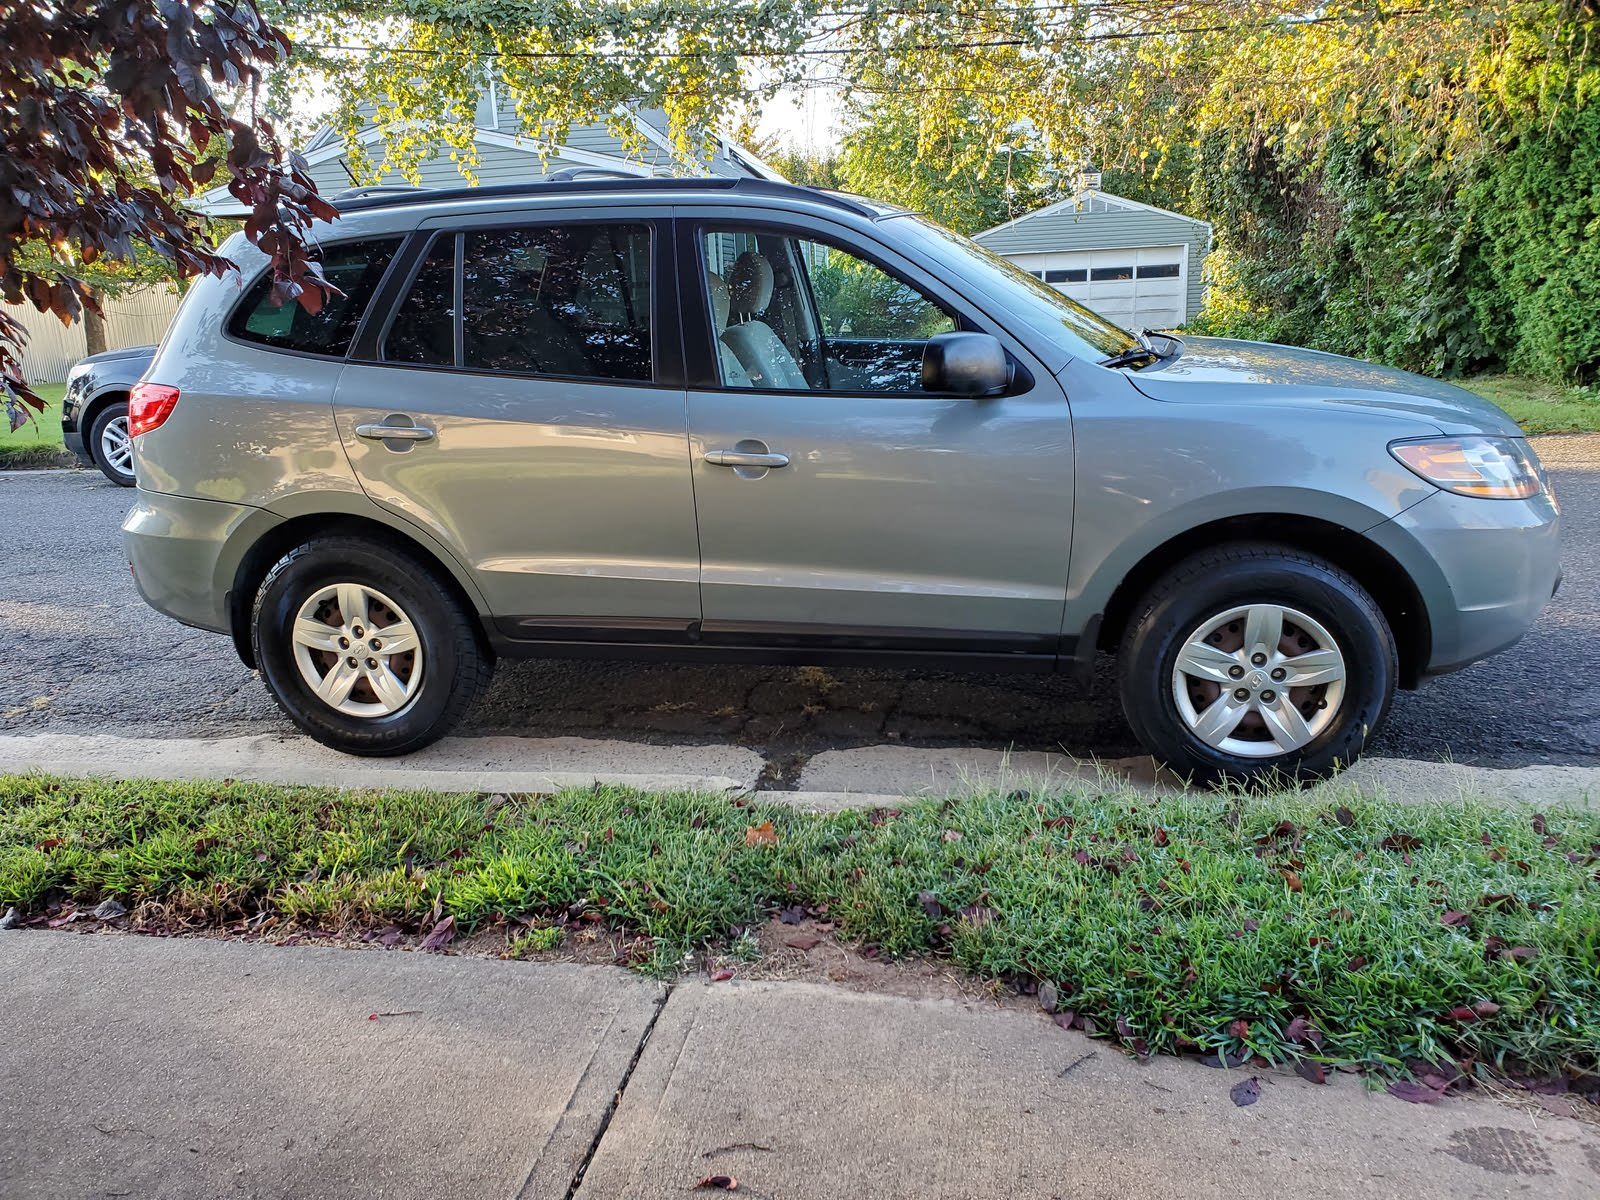 2009 hyundai santa fe test drive review cargurus 2009 hyundai santa fe test drive review